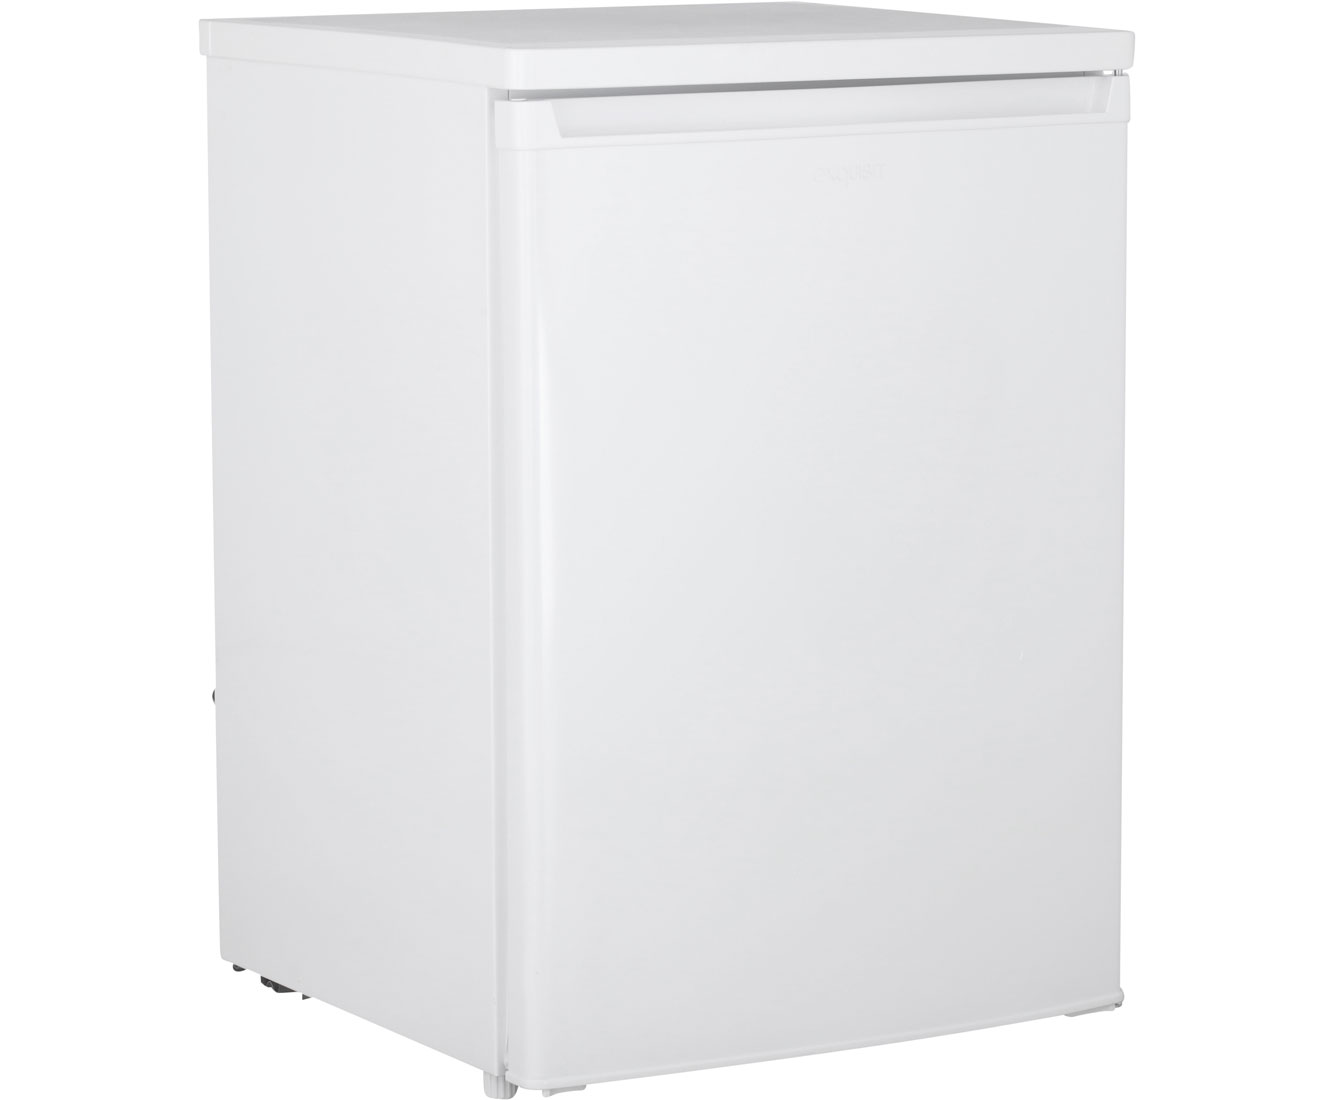 Aeg Kühlschrank Rkb64024dx : Kühlschrank a kühlschränke online shopping für bekleidung schuhe